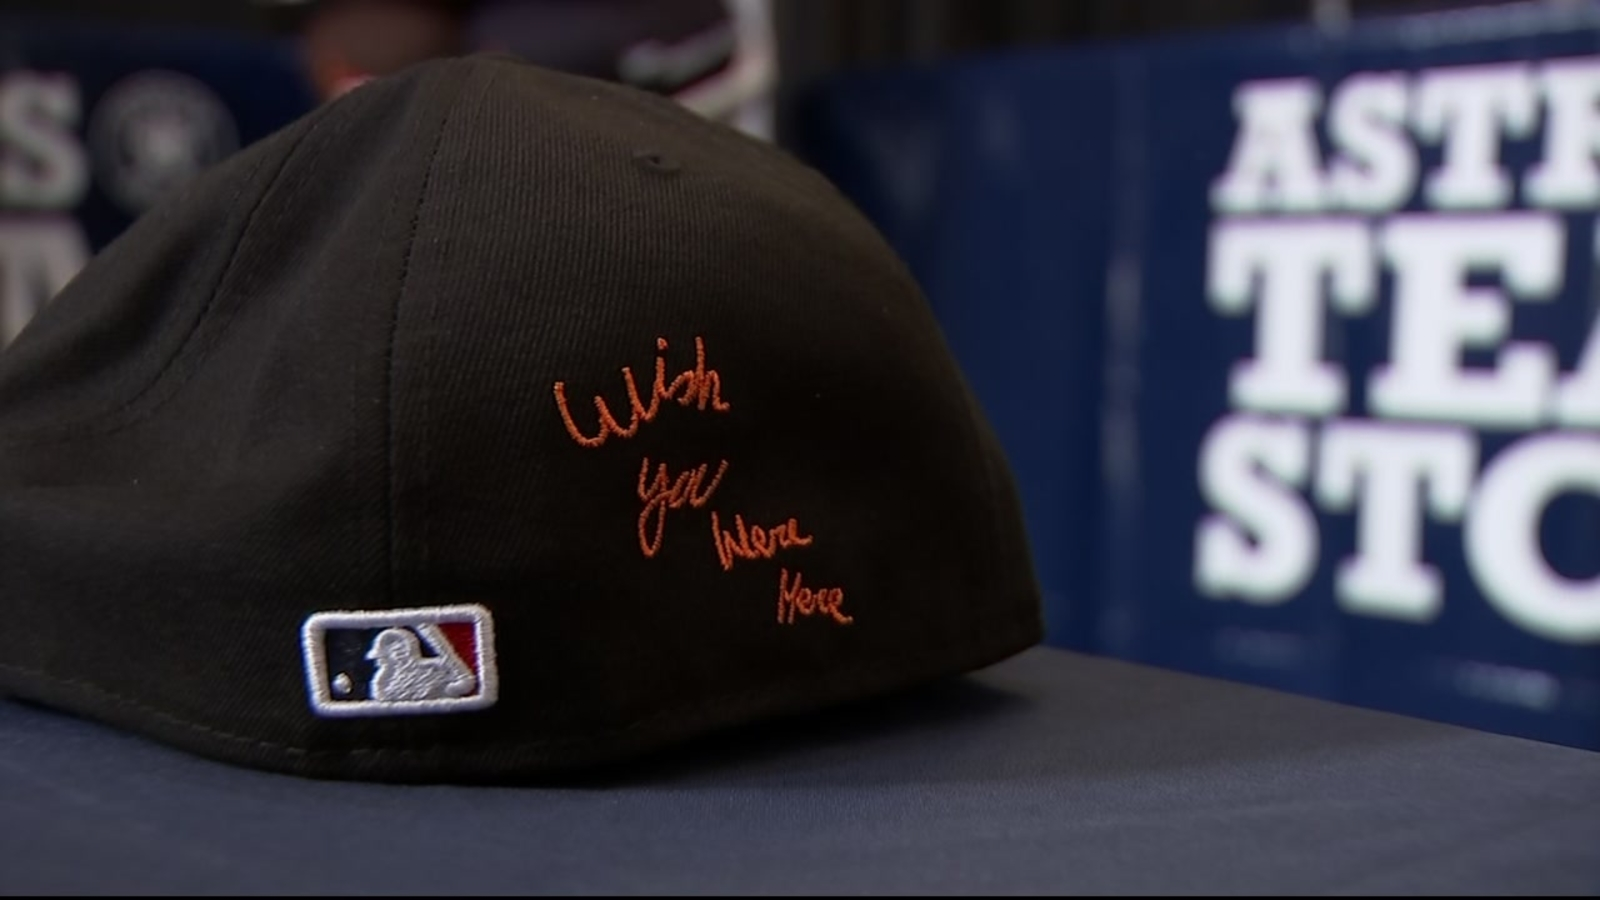 c2c3efb7789f4 Houston Astros Travis Scott hats sold out